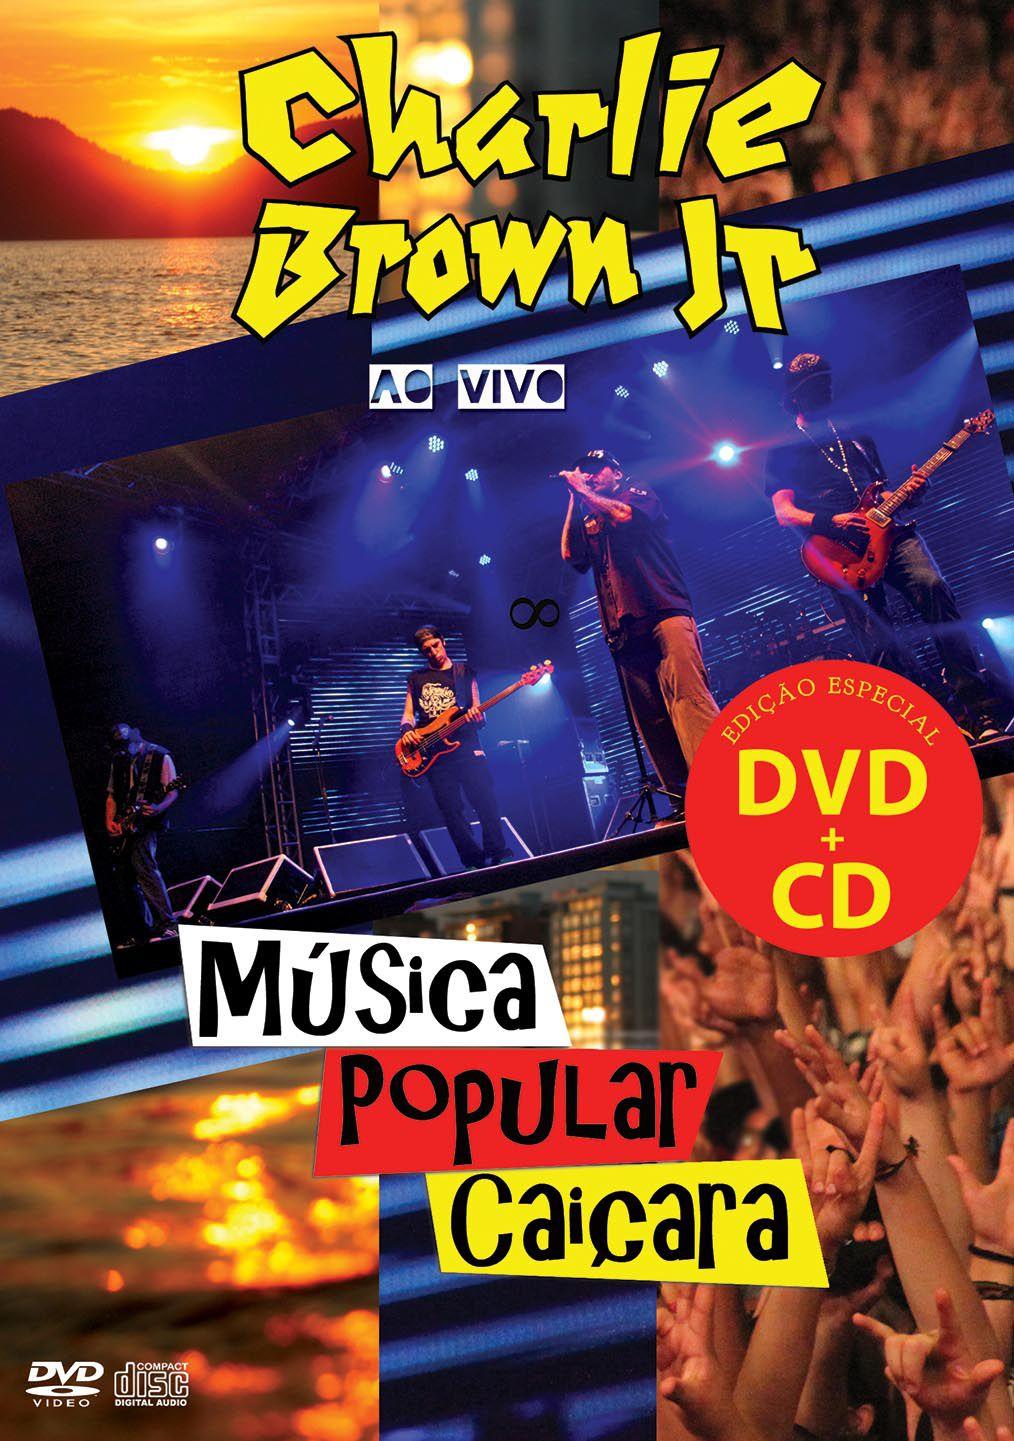 KIT DVD+CD CHARLIE BROWN JR - MÚSICA POPULAR CAIÇARA